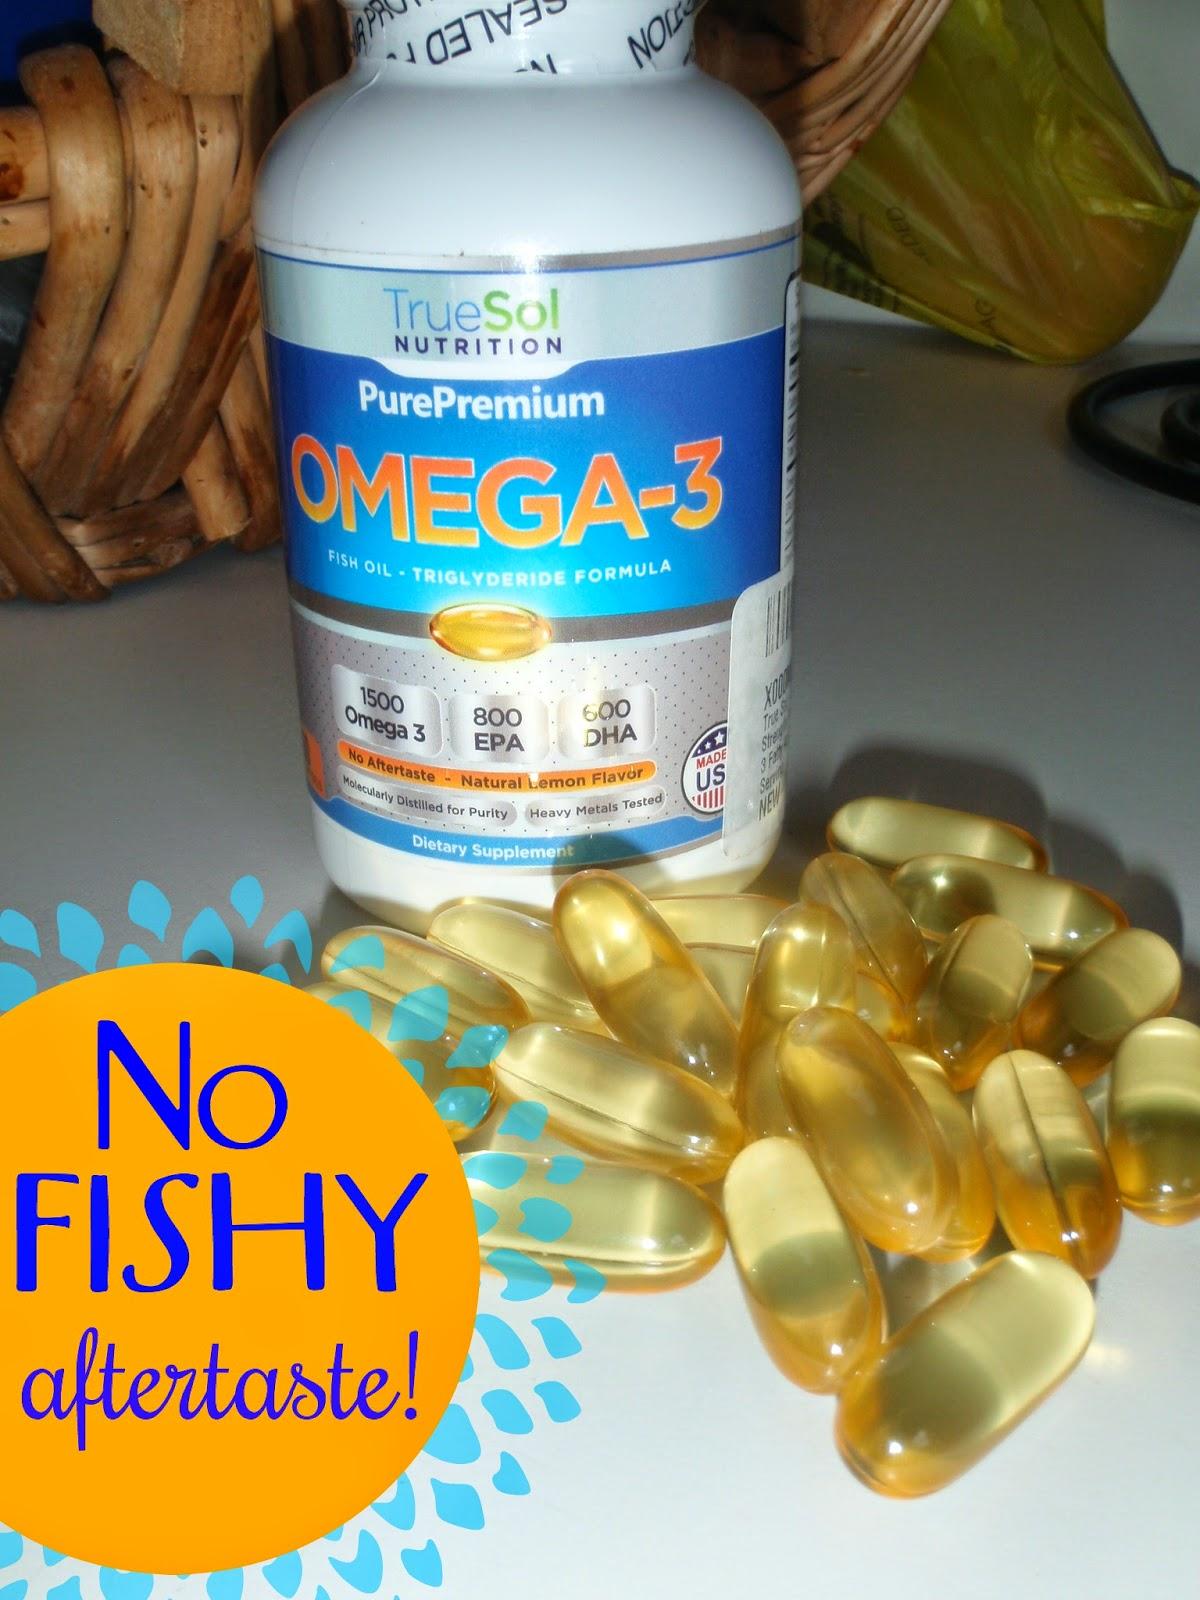 True sol omega 3 fish oil giveaway jays sweet n sour life for Fish oil depression dosage